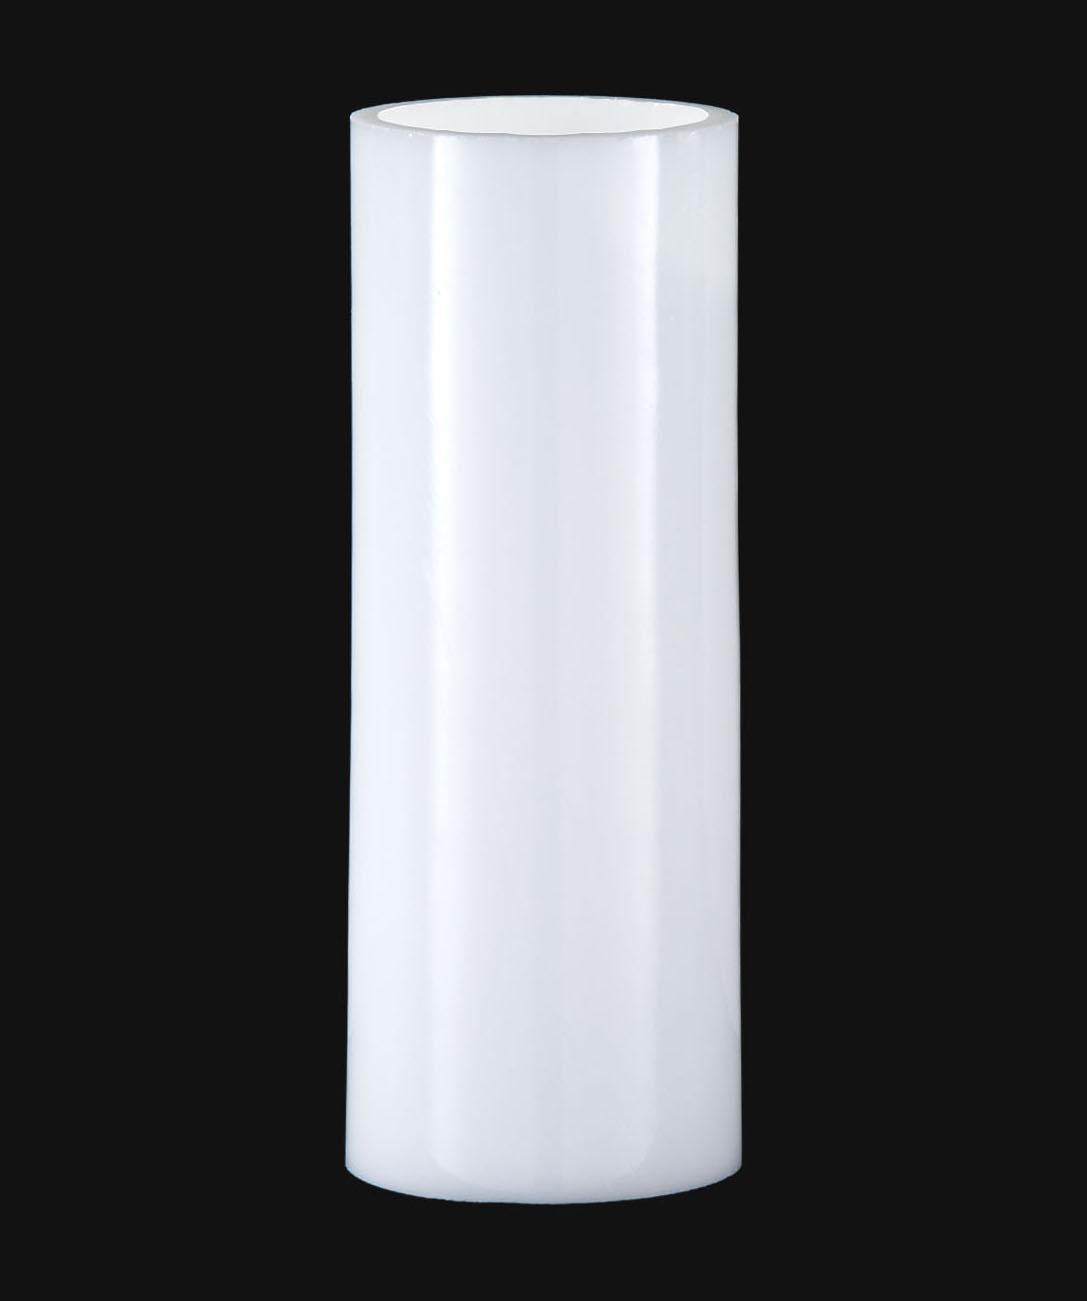 Mid Century Modern Opal Cylinder Shades 00250 B Amp P Lamp